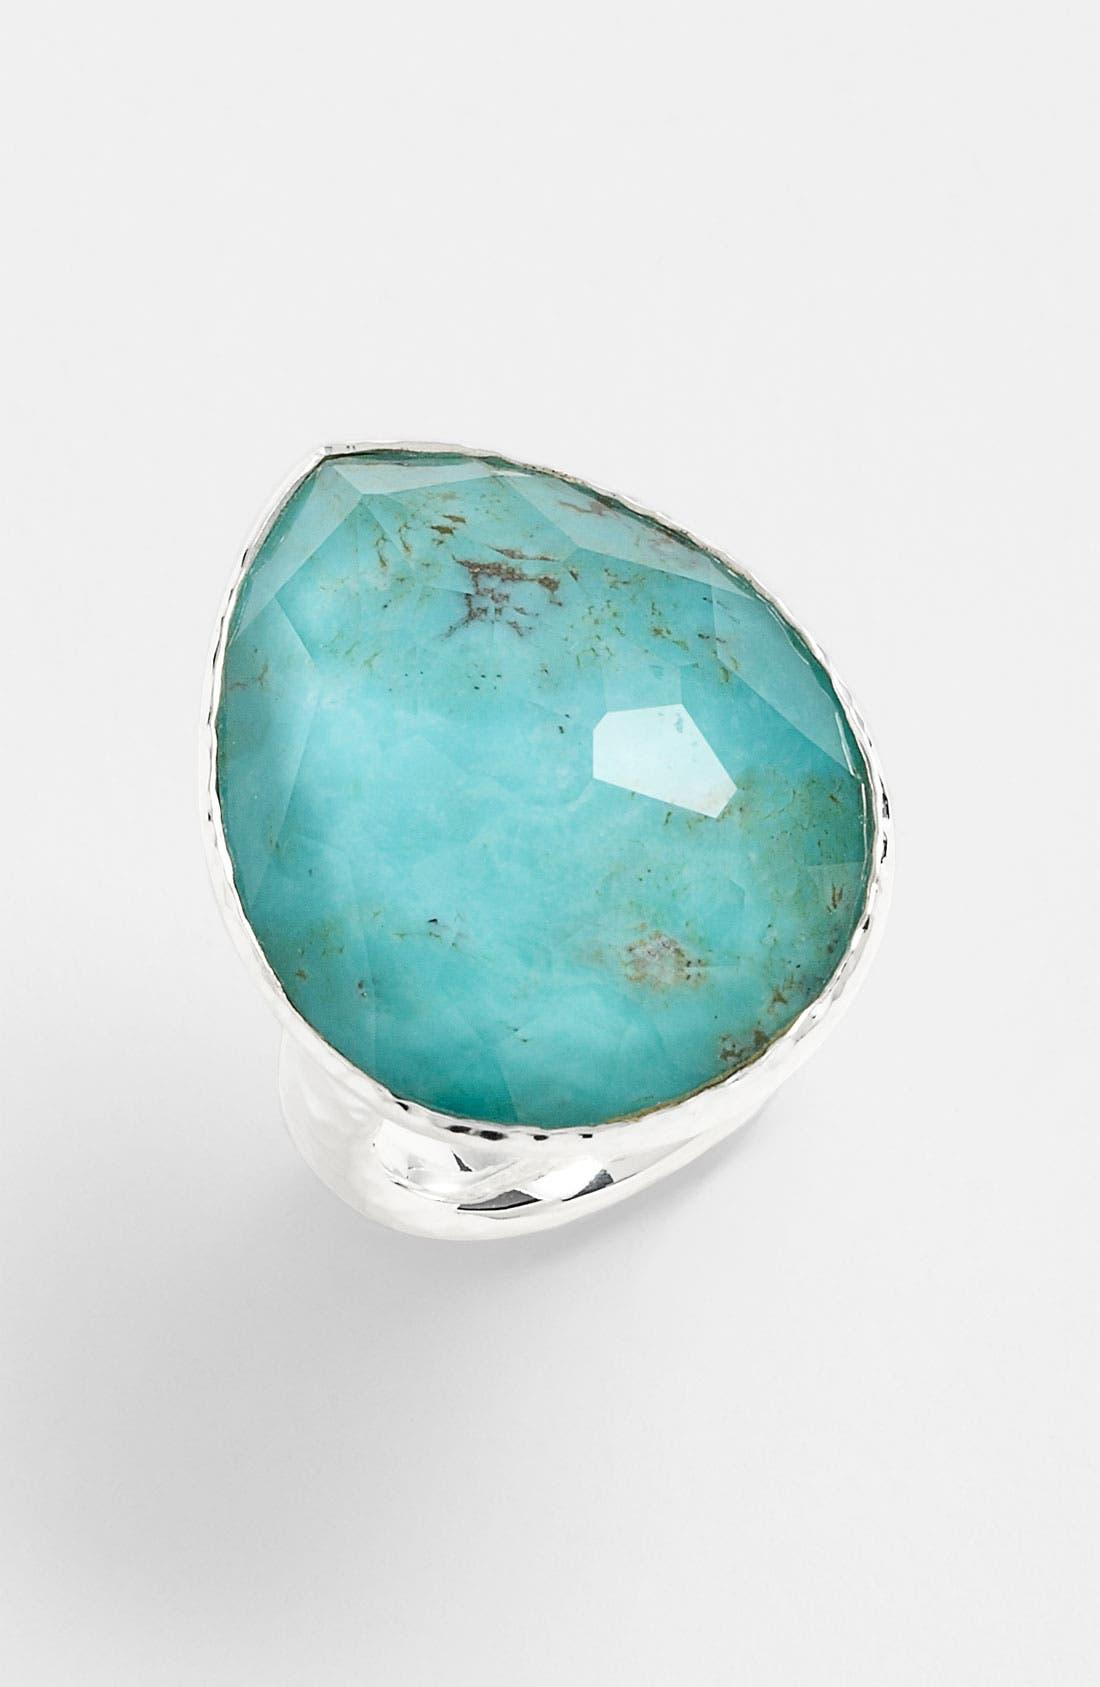 Alternate Image 1 Selected - Ippolita 'Grotto' Large Teardrop Ring